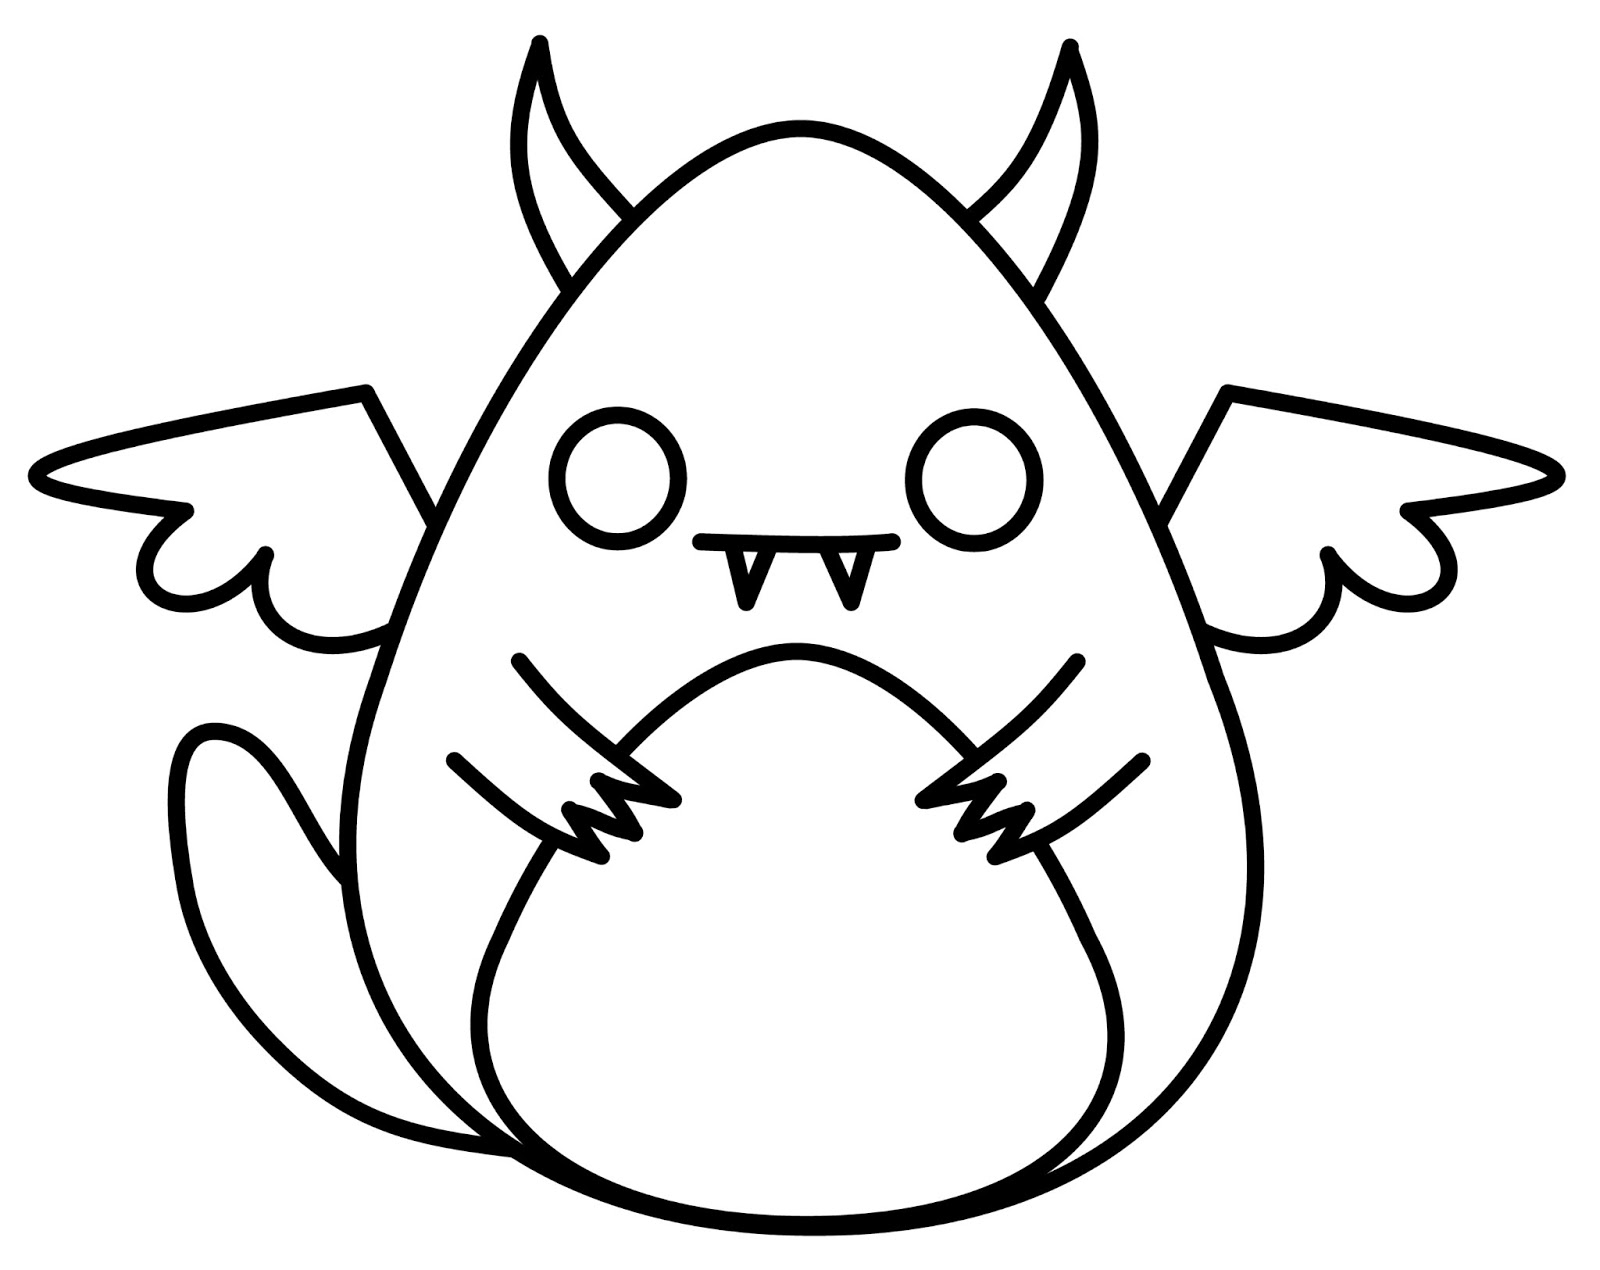 1600x1270 Cute N Kawaii How To Draw A Kawaii Monster